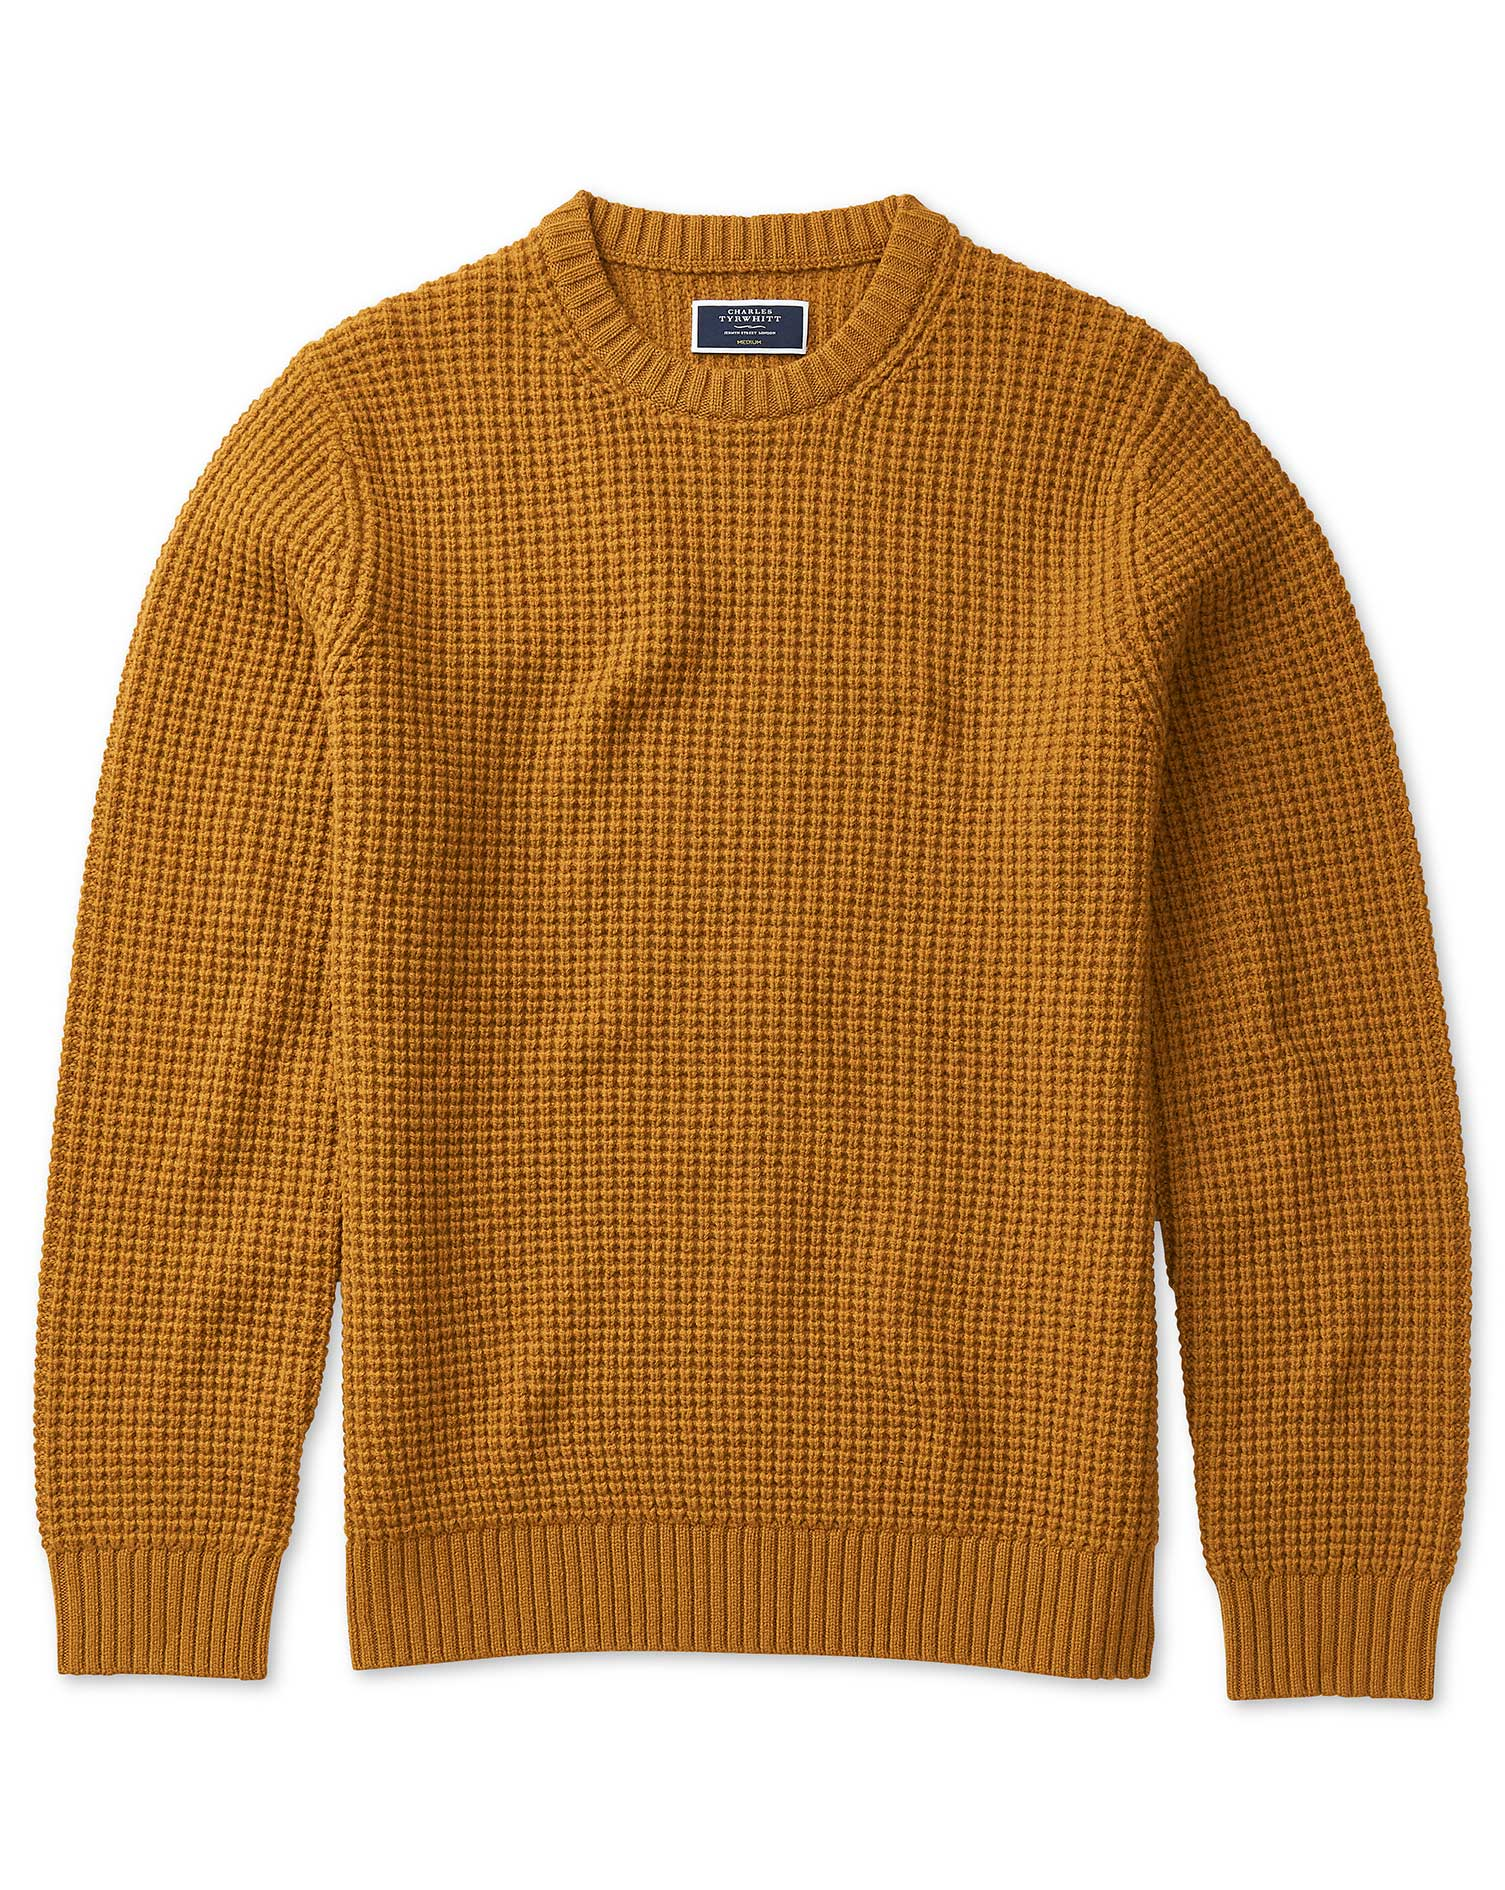 100Percent Merino Wool Mustard Chunky Merino Waffle Stitch Crew Neck Jumper